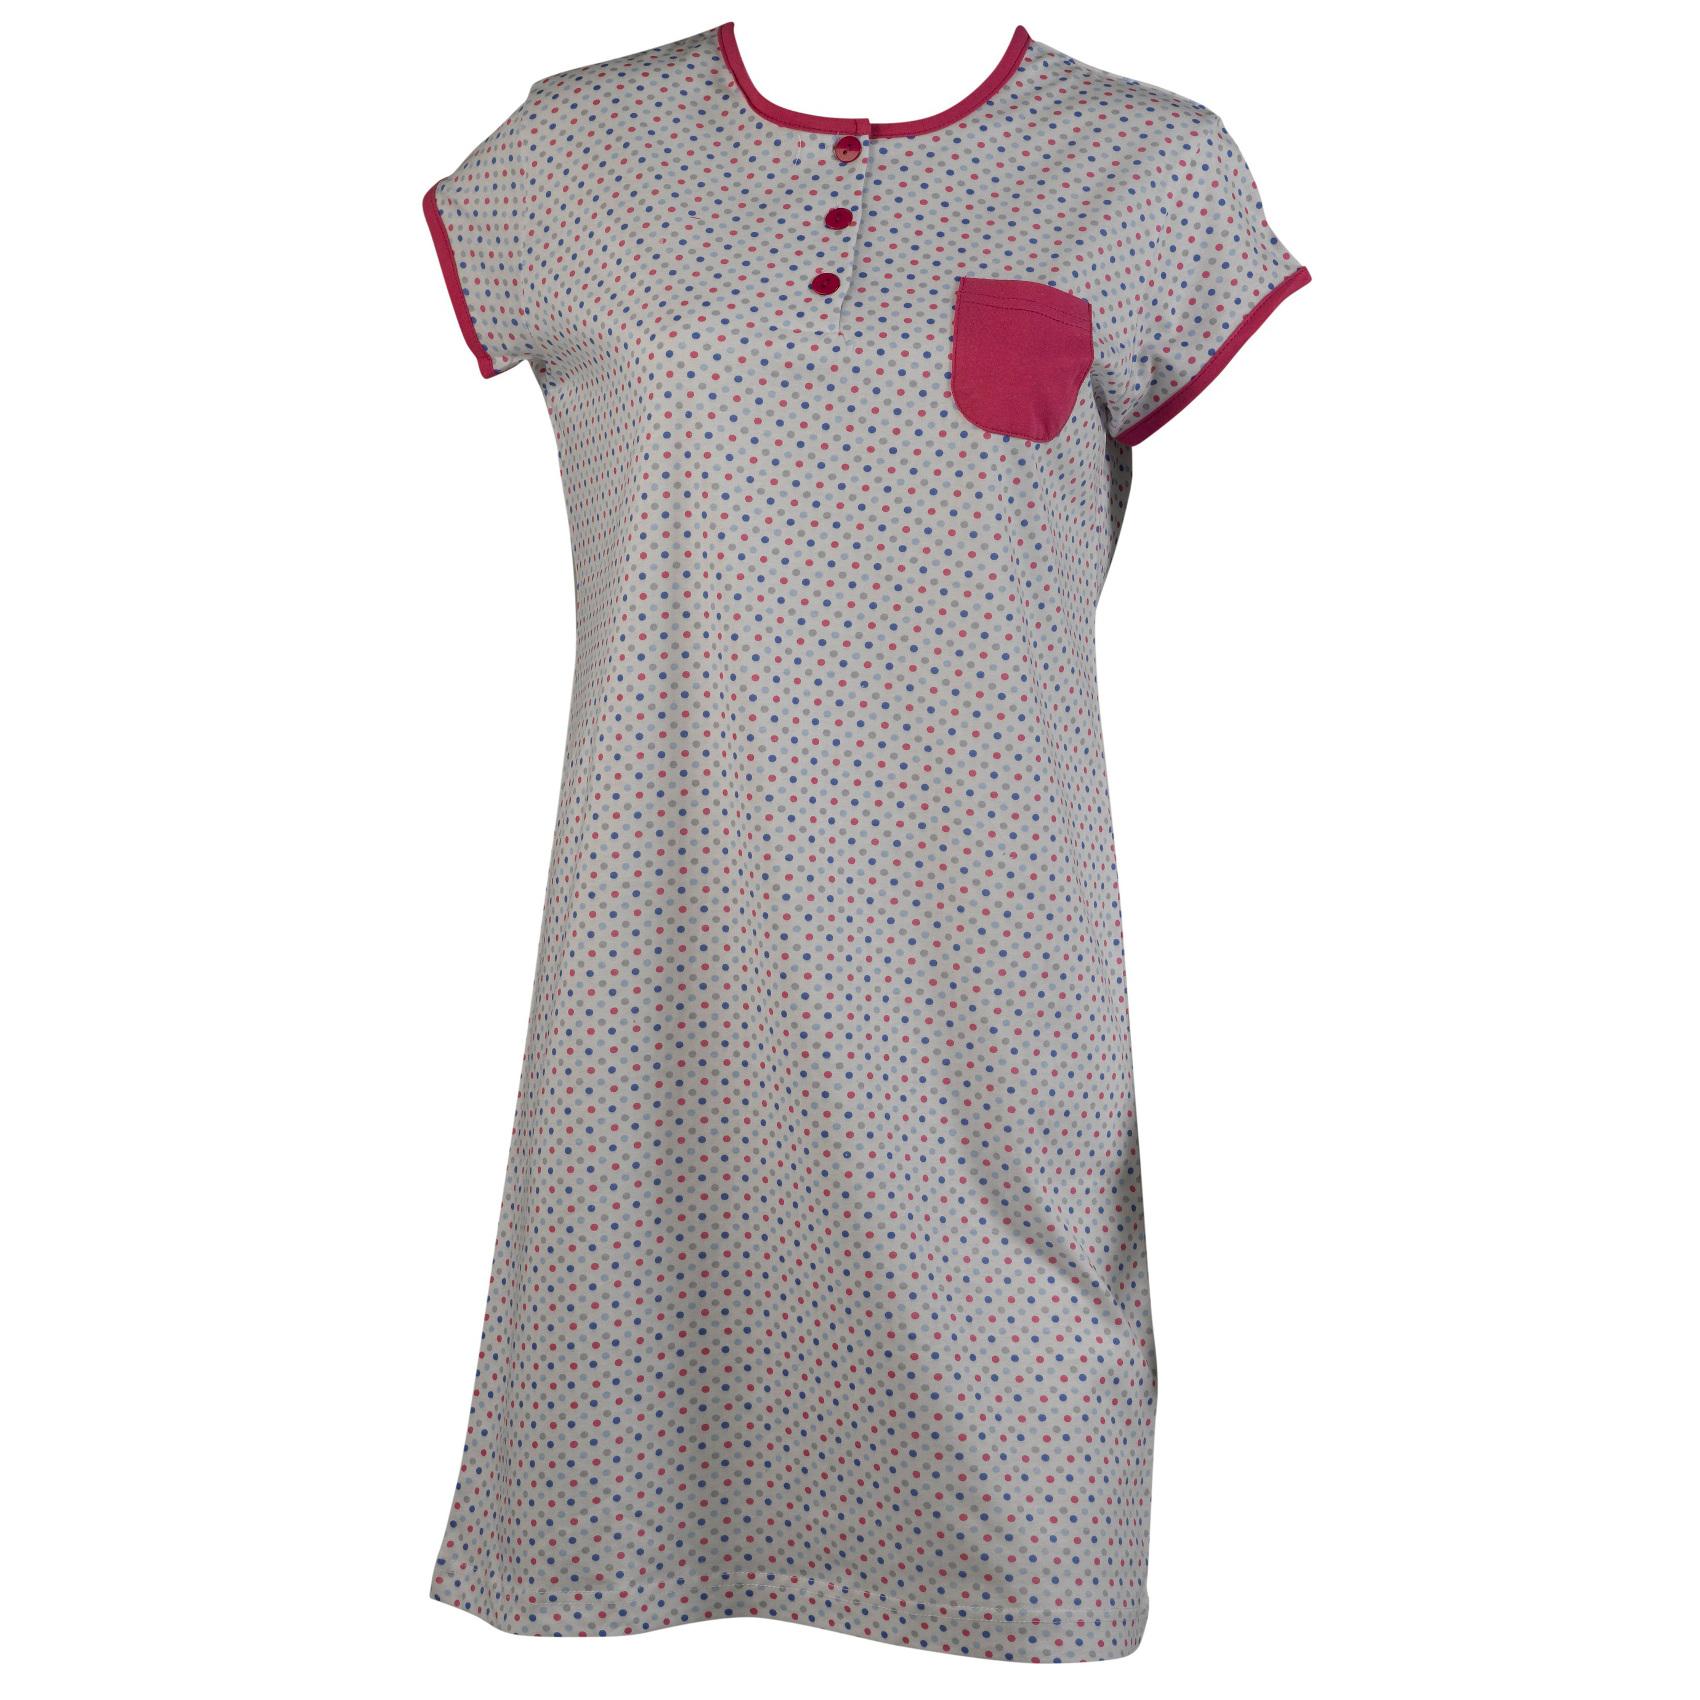 19c28e10d239 Ladies Short Sleeved Spotty Night Dress 100 Cotton Womens Polka Dot ...